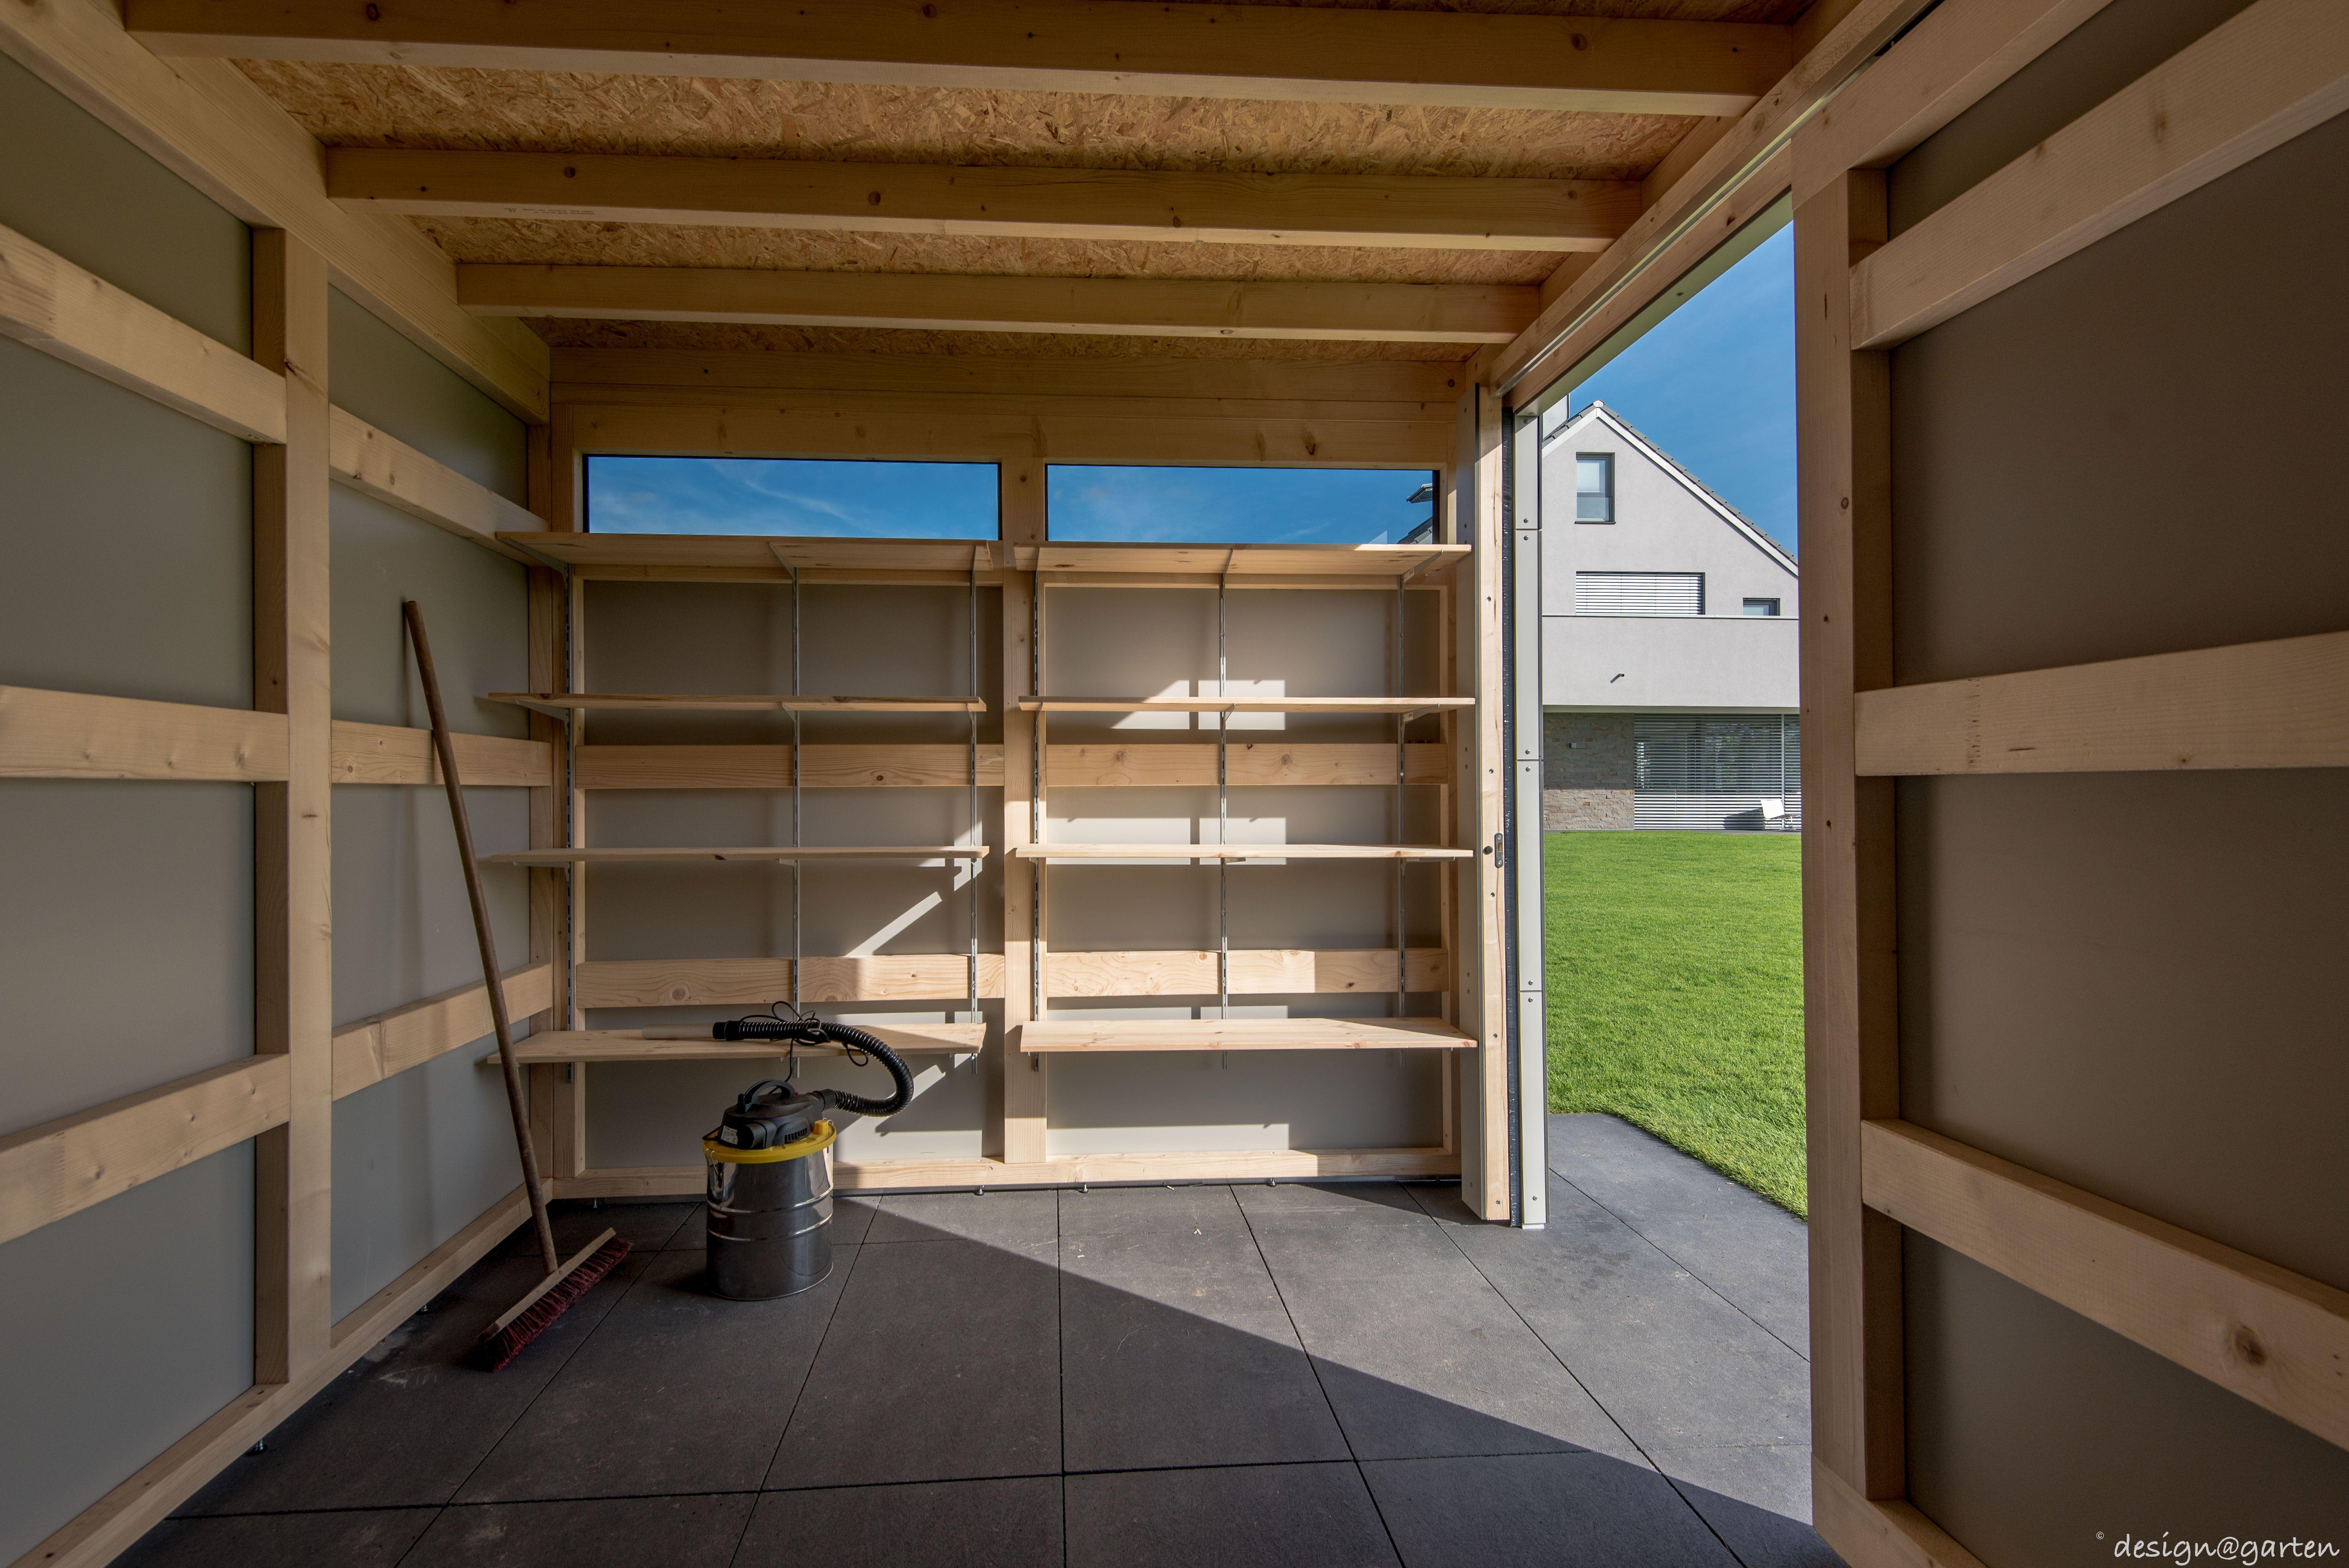 gartenhaus ausstellung pforzheim my blog. Black Bedroom Furniture Sets. Home Design Ideas